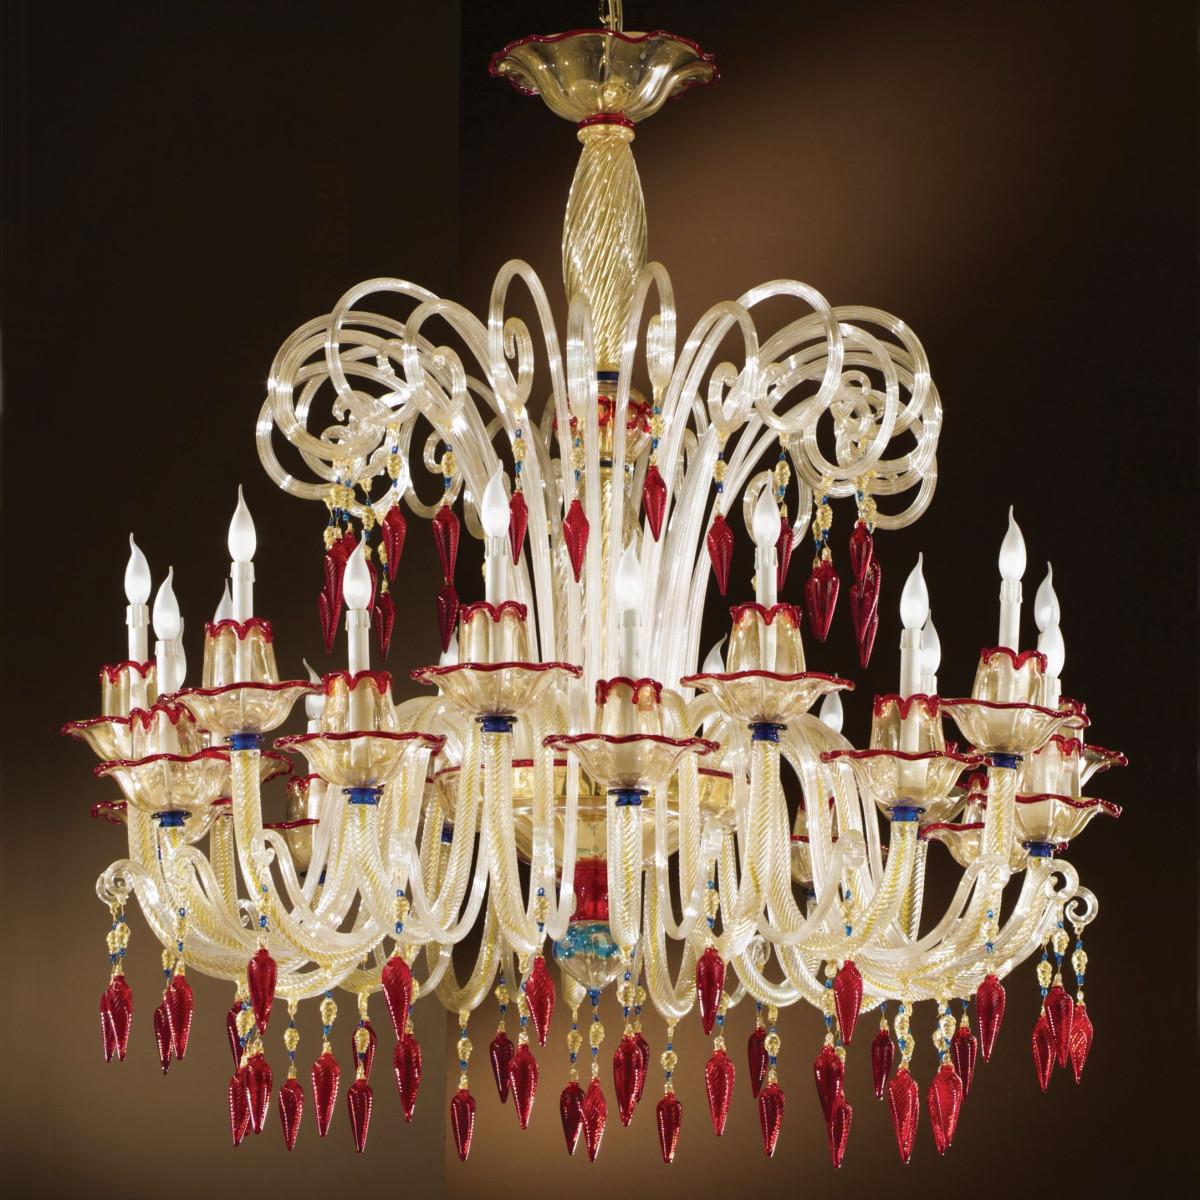 """Mocenigo"" lampara de cristal de Murano - 10+10 luces"